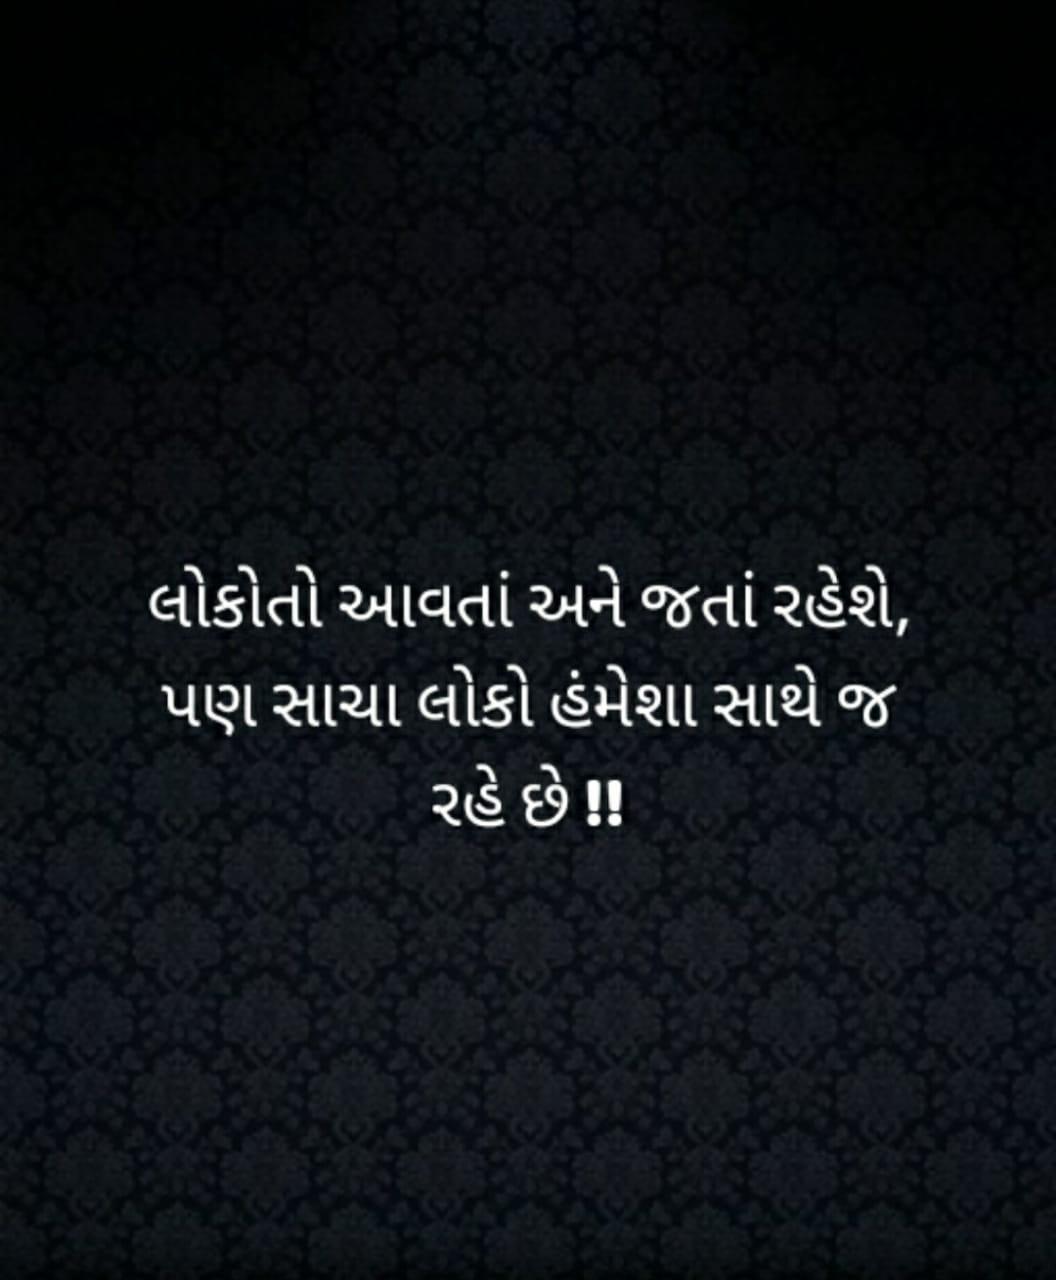 suvichar-in-gujarati-status-17.jpg